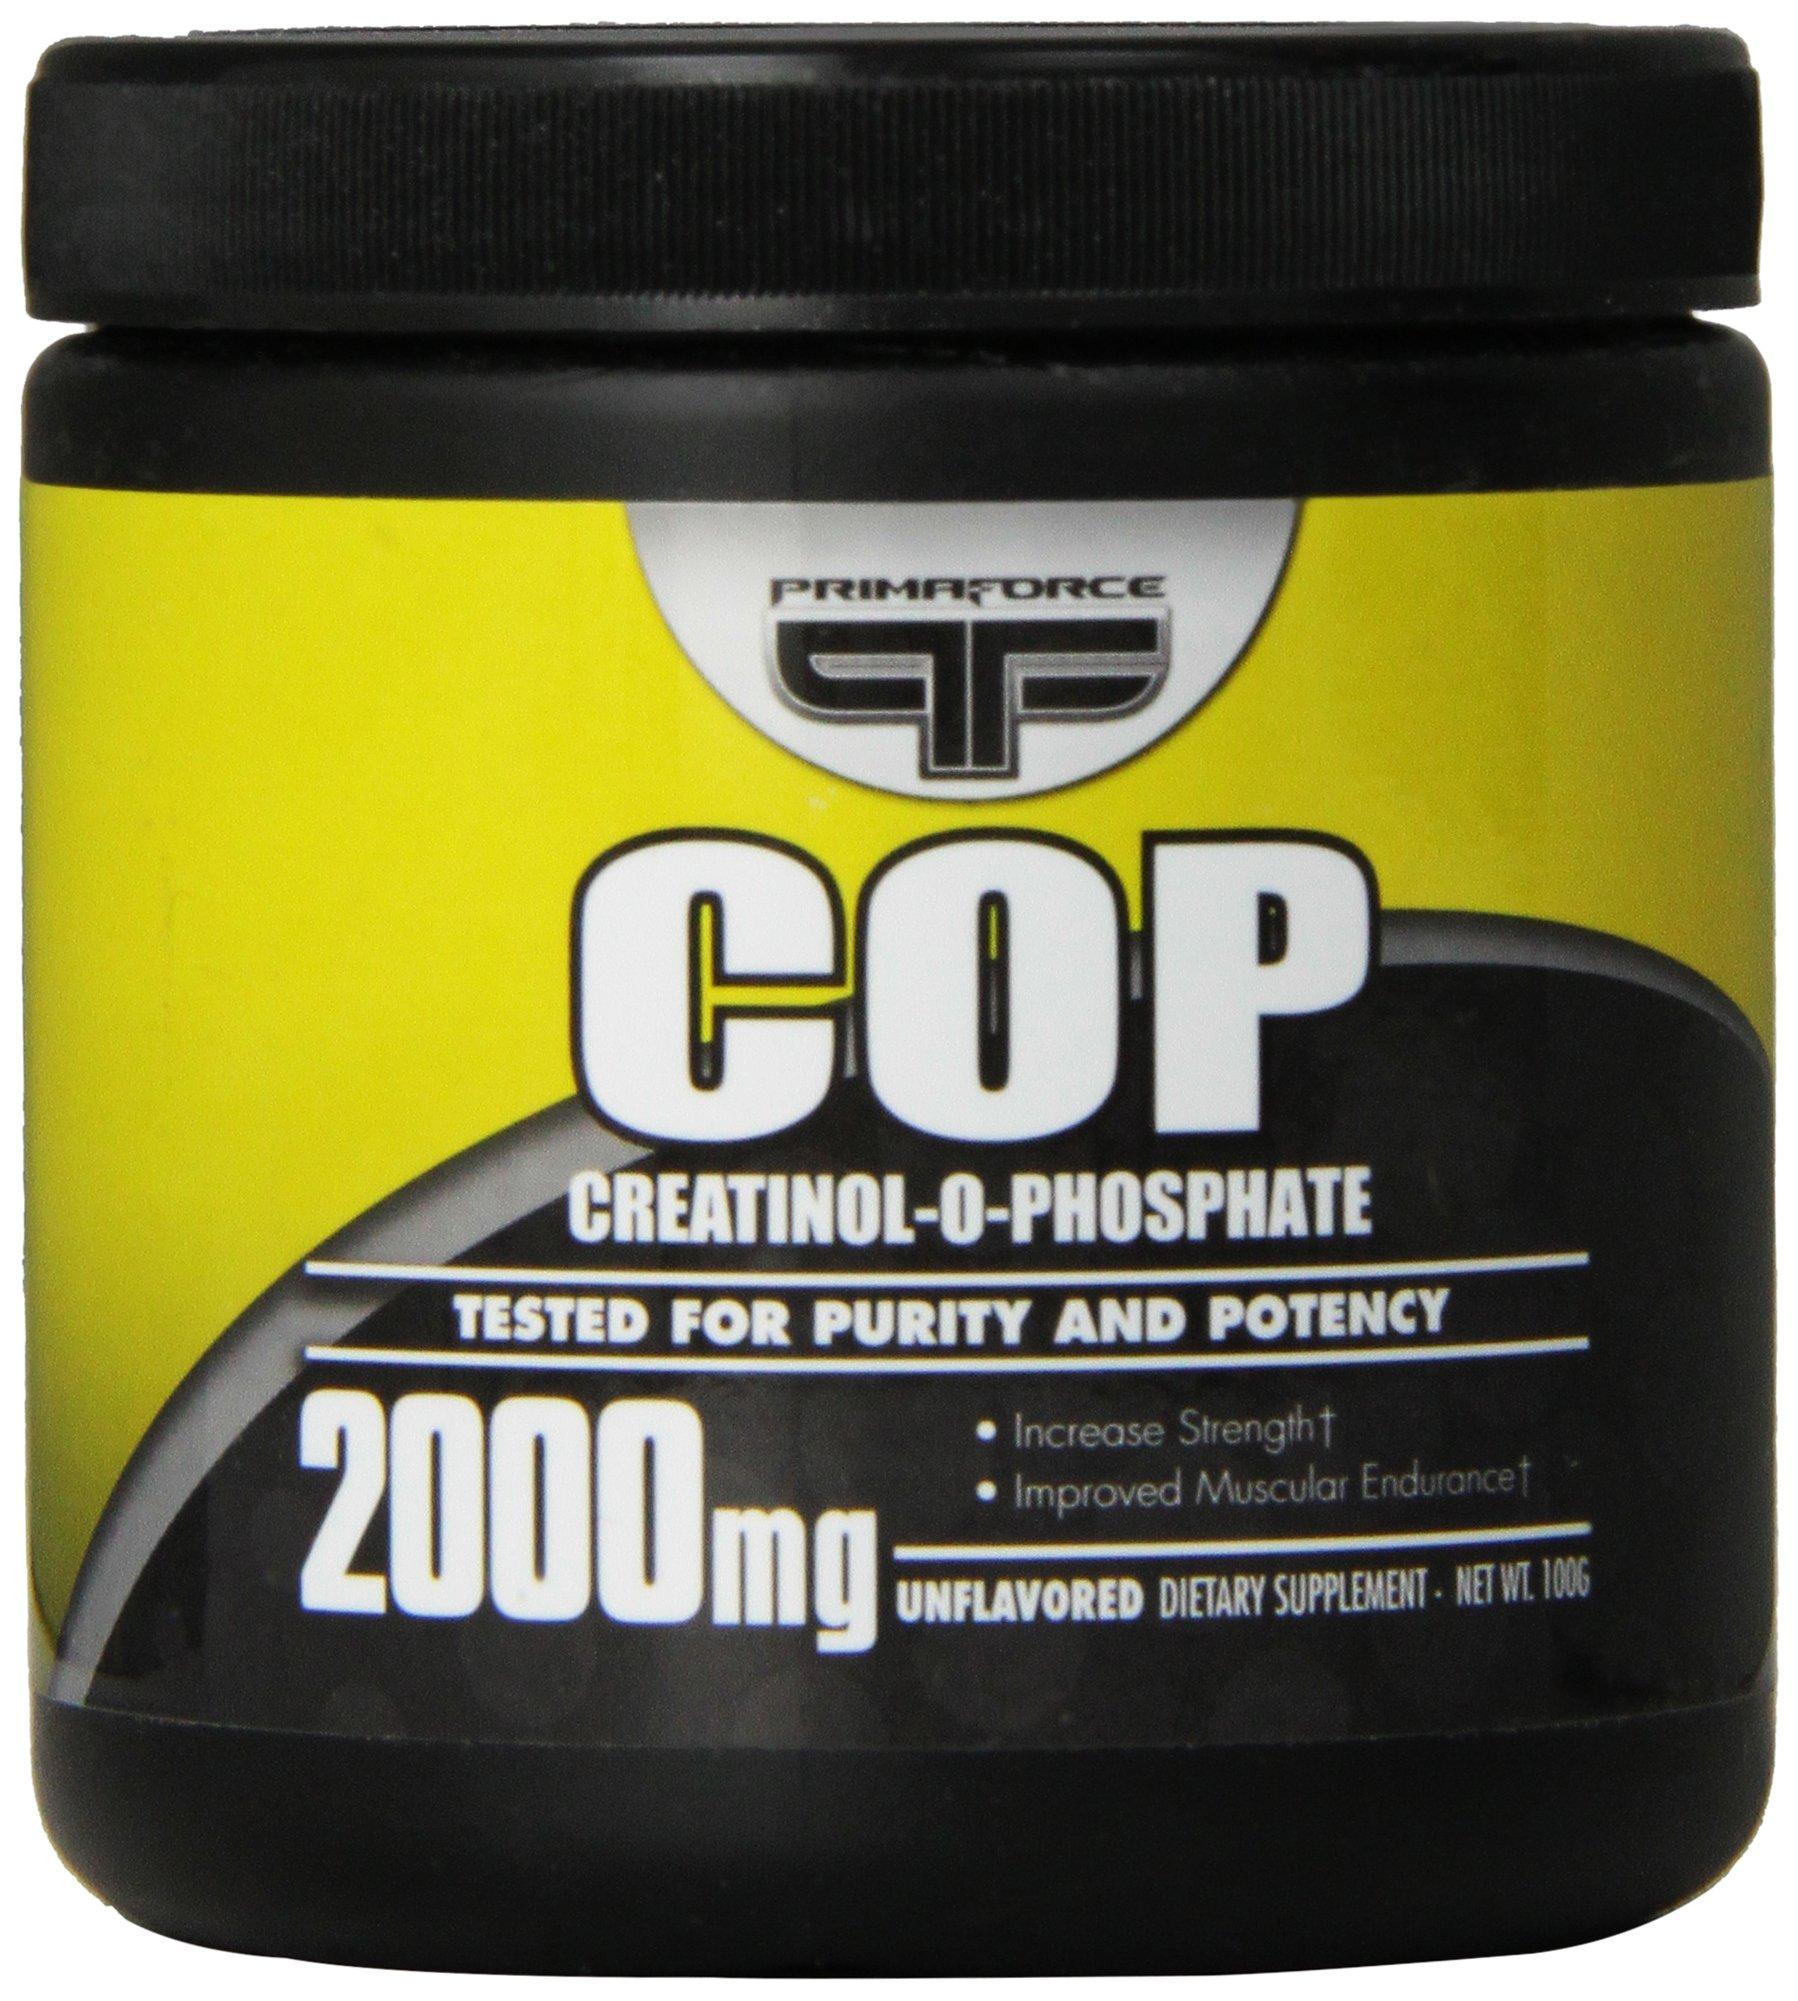 Prima Force Creatinol O Phosphate Nutritional Supplement, 100 Gram